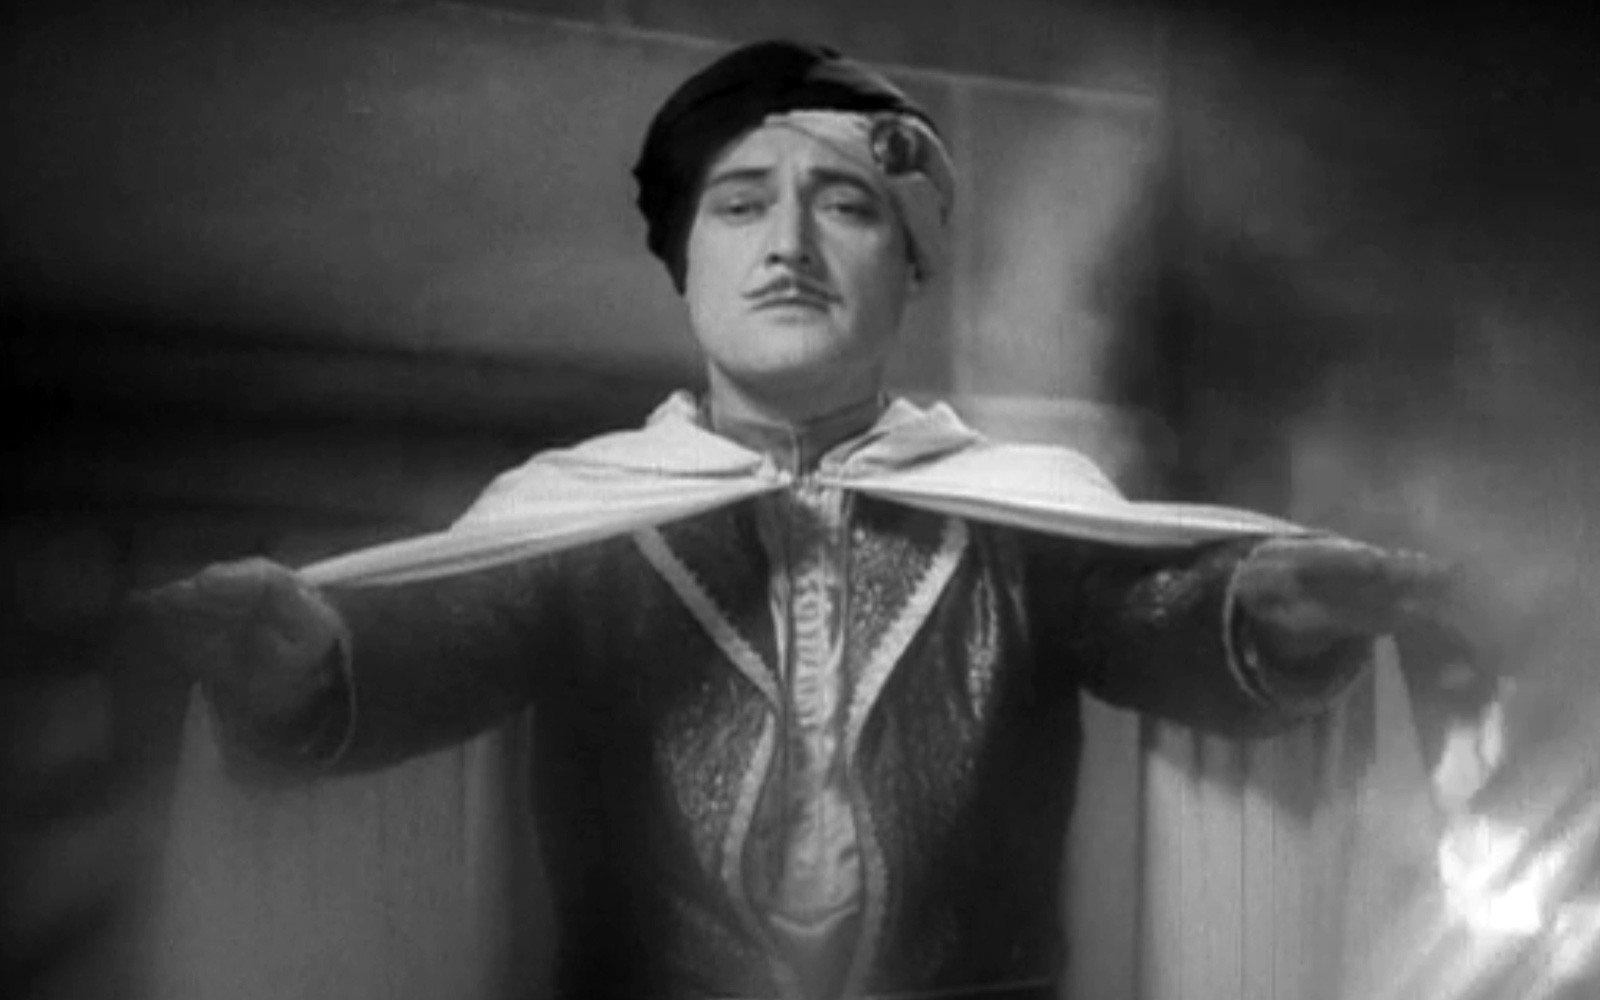 Chandu the Magician - William Cameron Menzies, Marcel Varnel